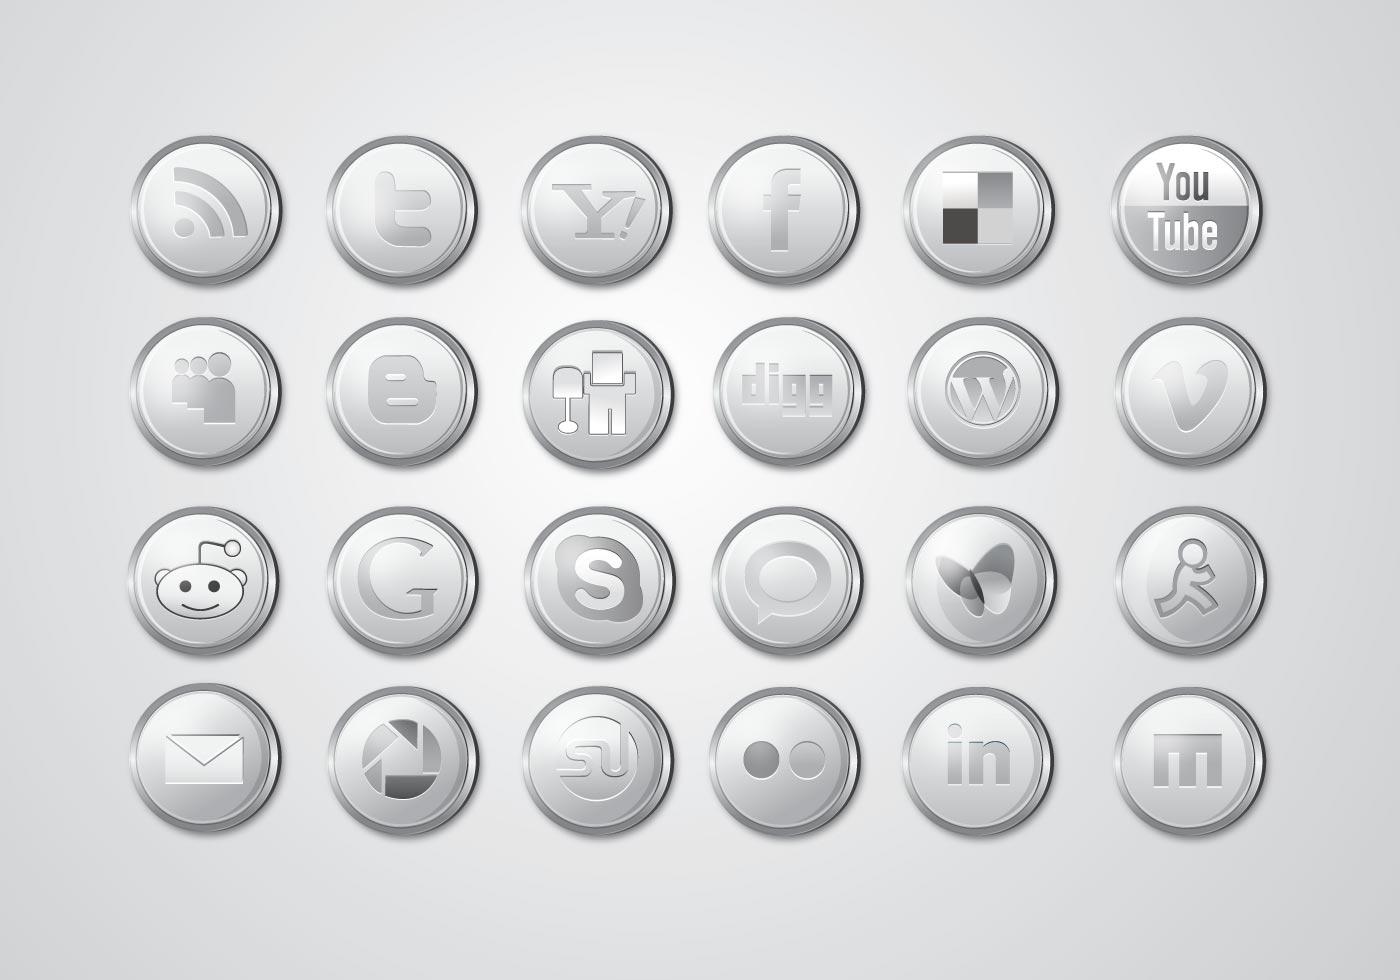 Social media clipart pack transparent Free Social Media Icons - Download SVG, EPS & PNG transparent